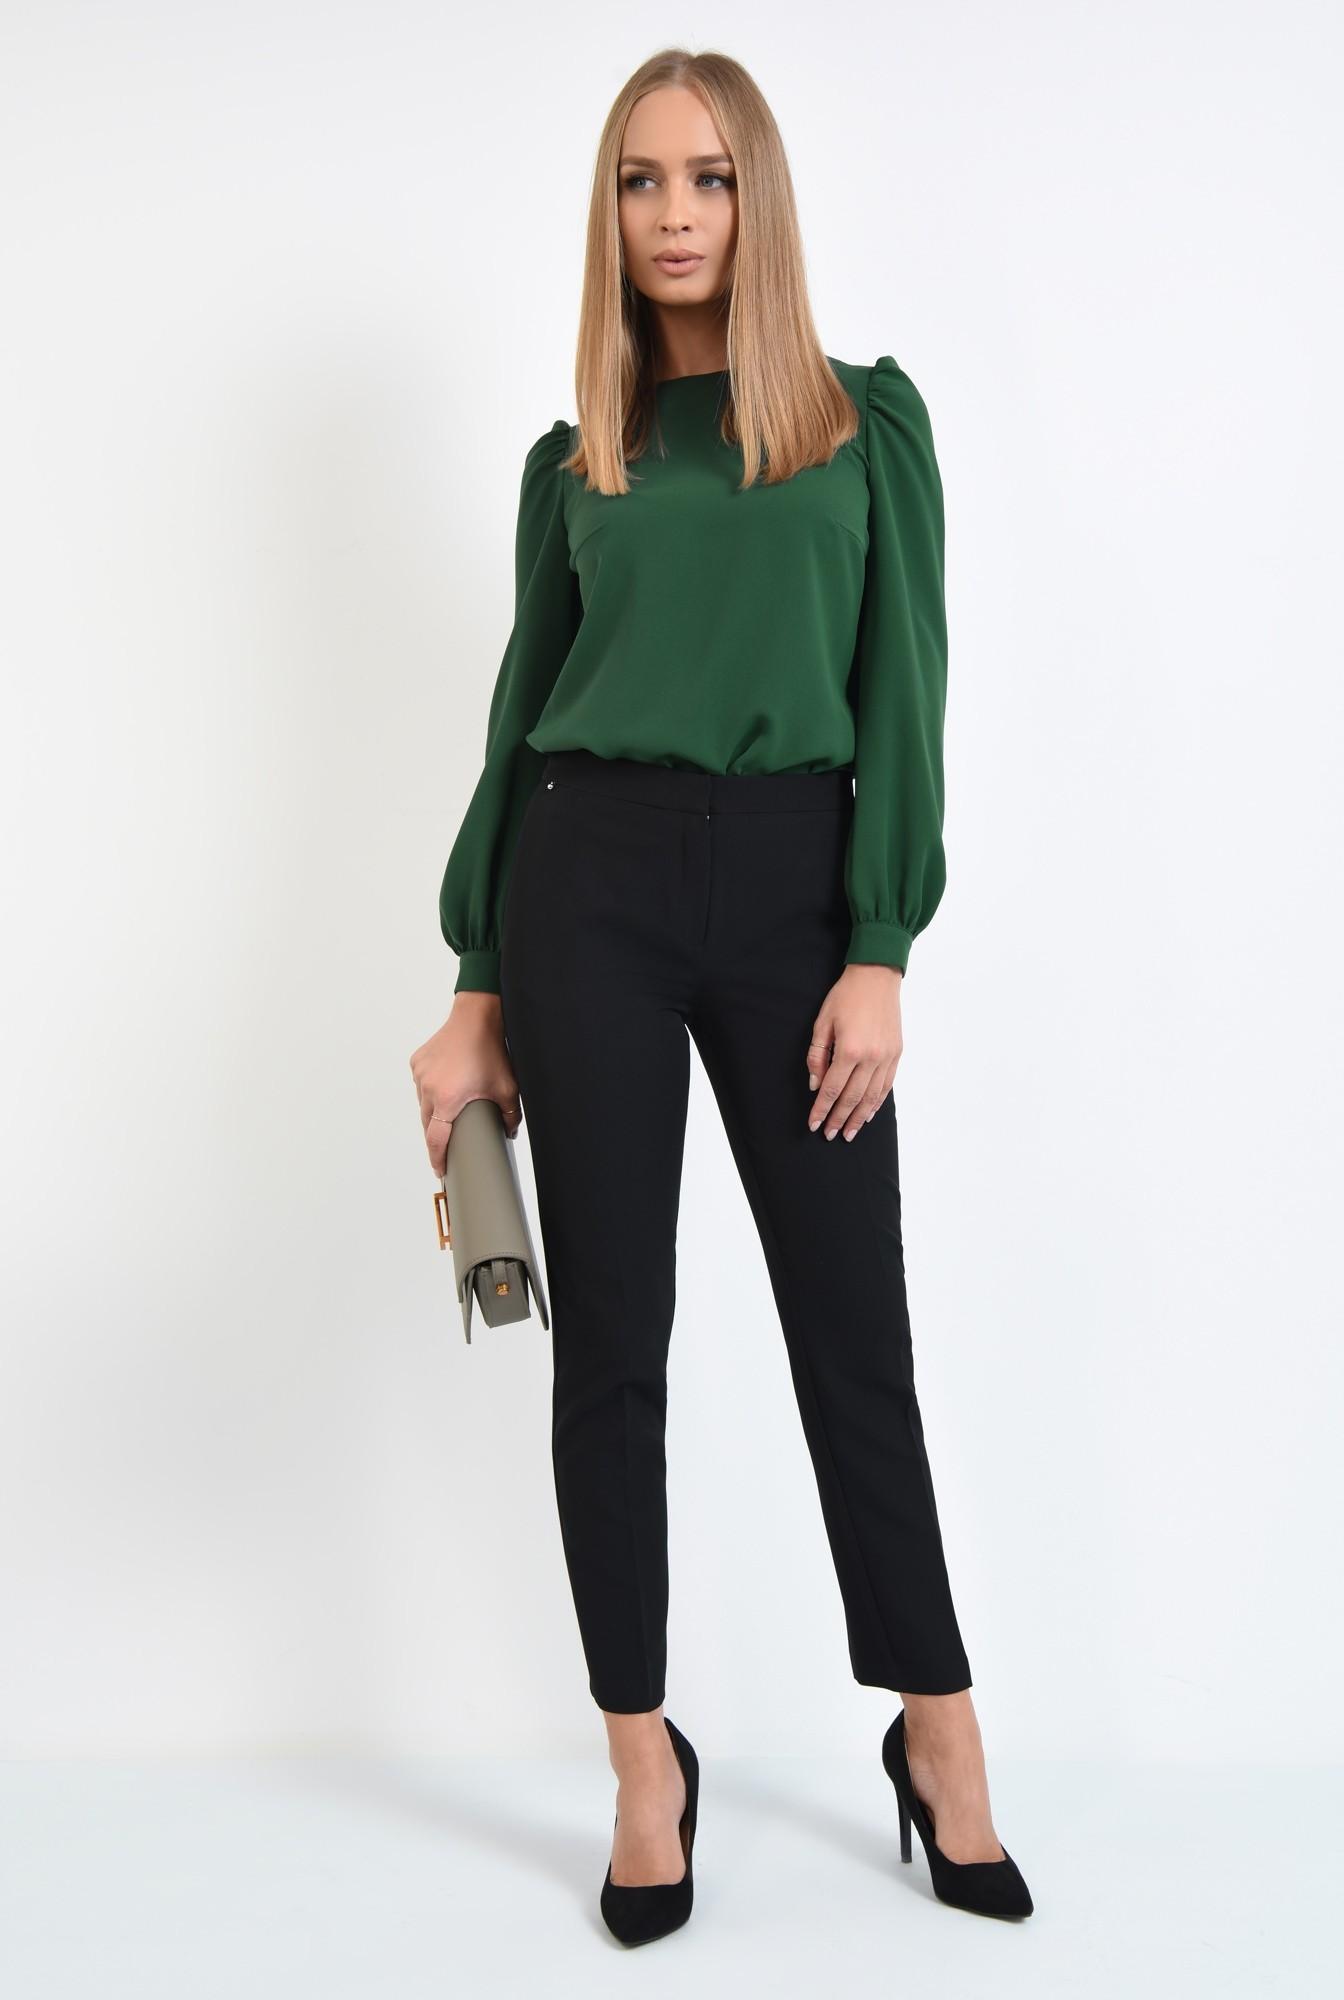 3 - pantaloni casual, negru, talie medie, buzunare